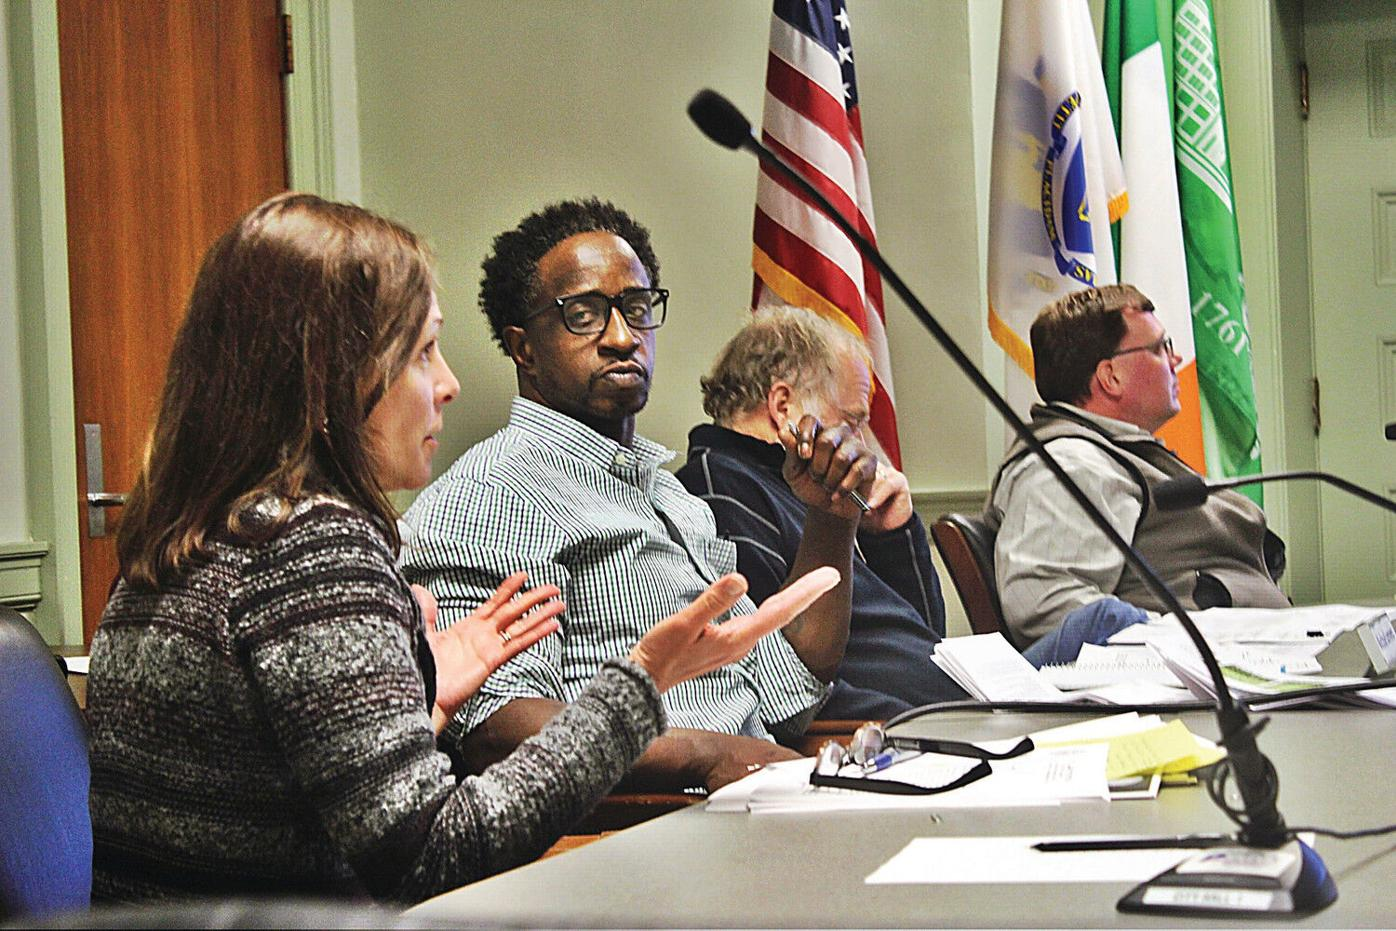 Pittsfield Board of Health backs plan to overhaul trash-pickup program (copy)